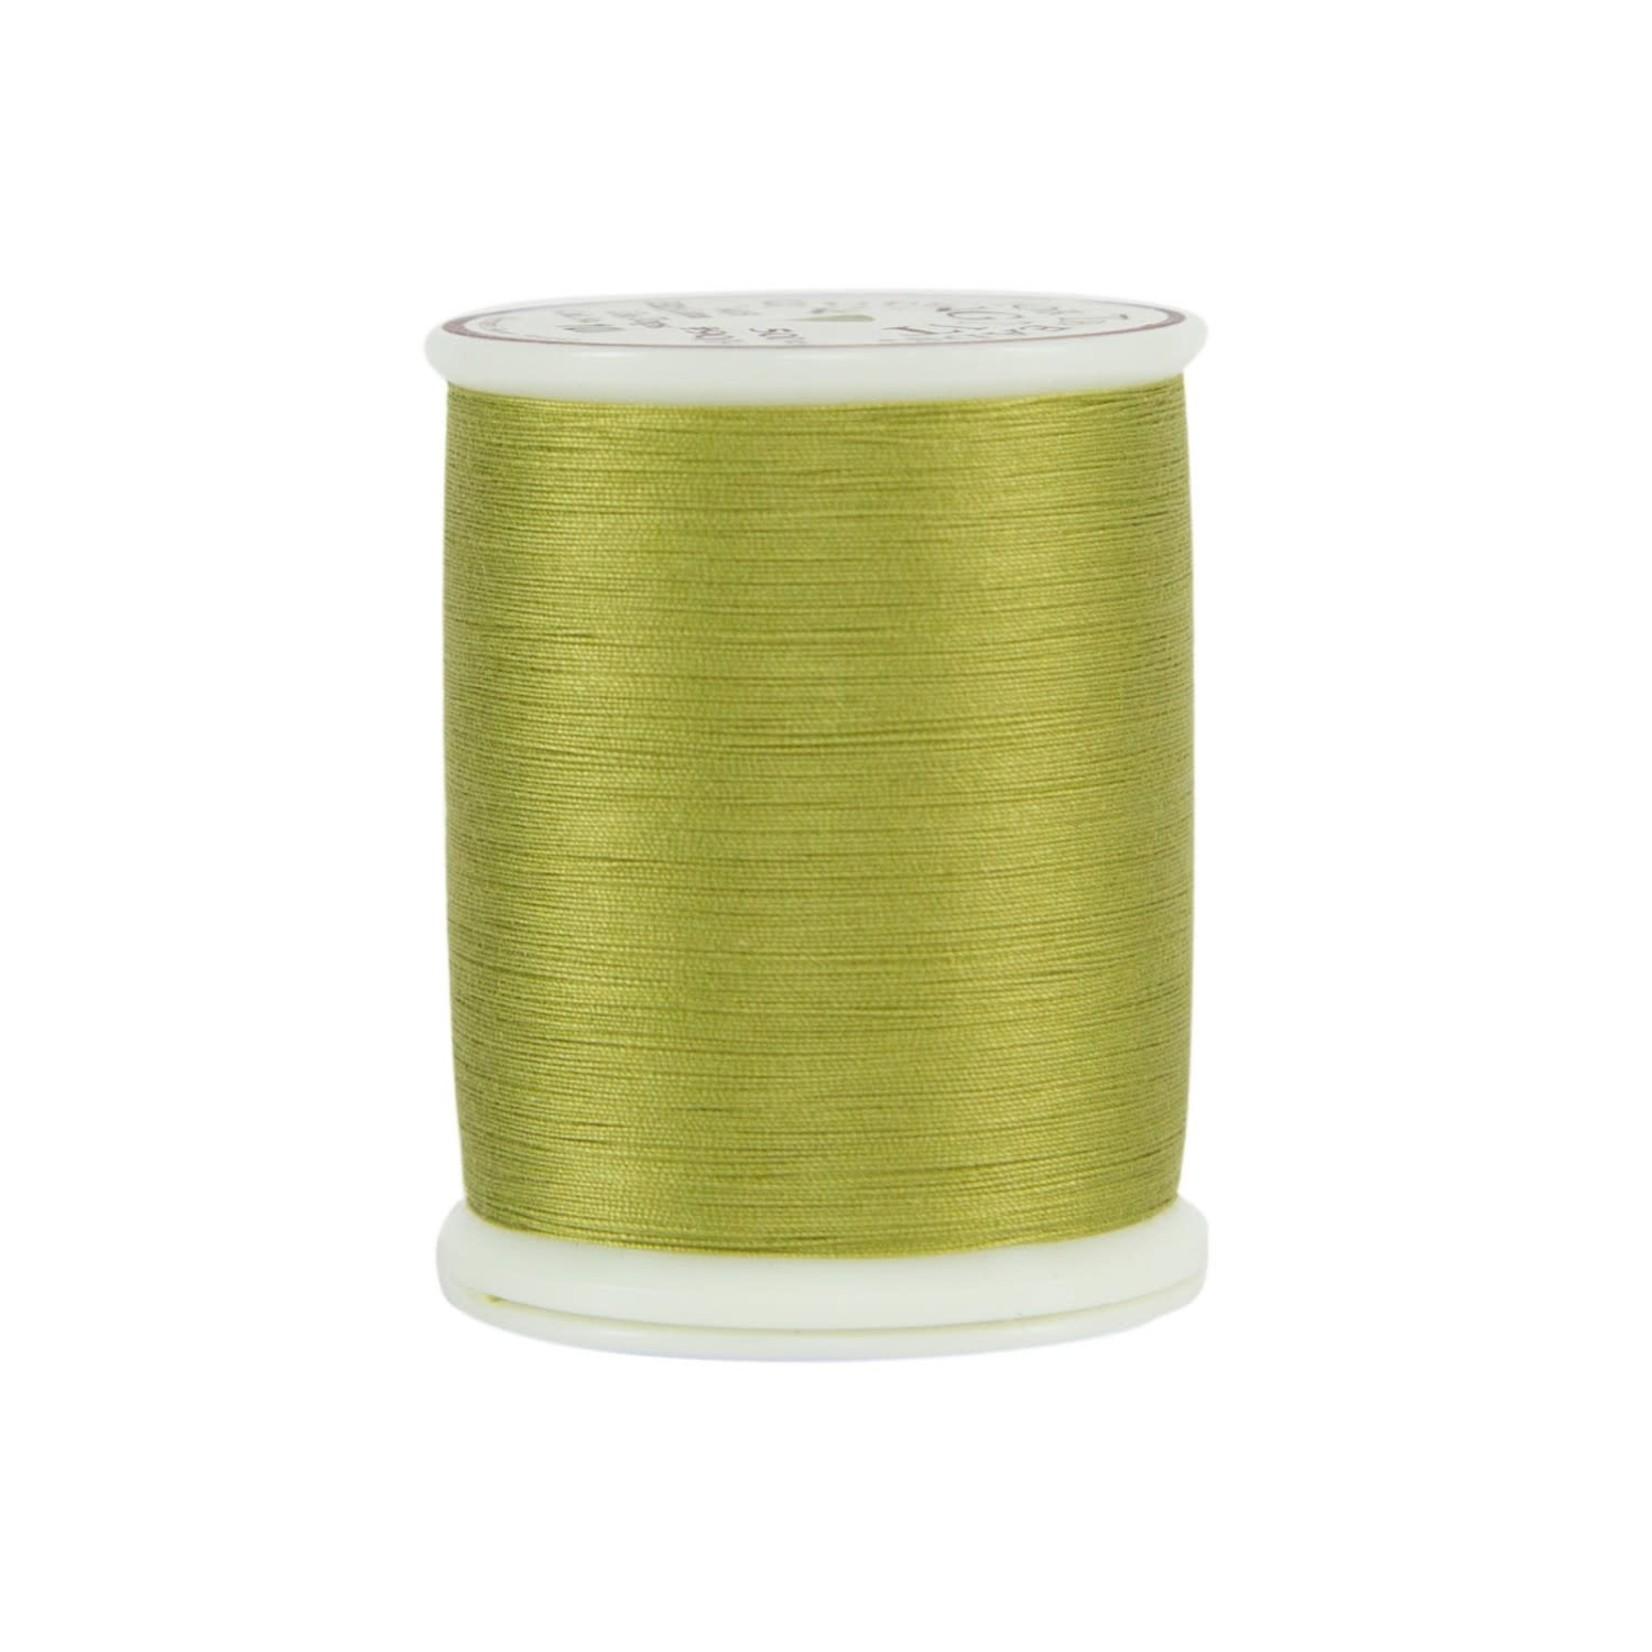 Superior Threads King Tut - #40 - 457 m - 1006 Dill